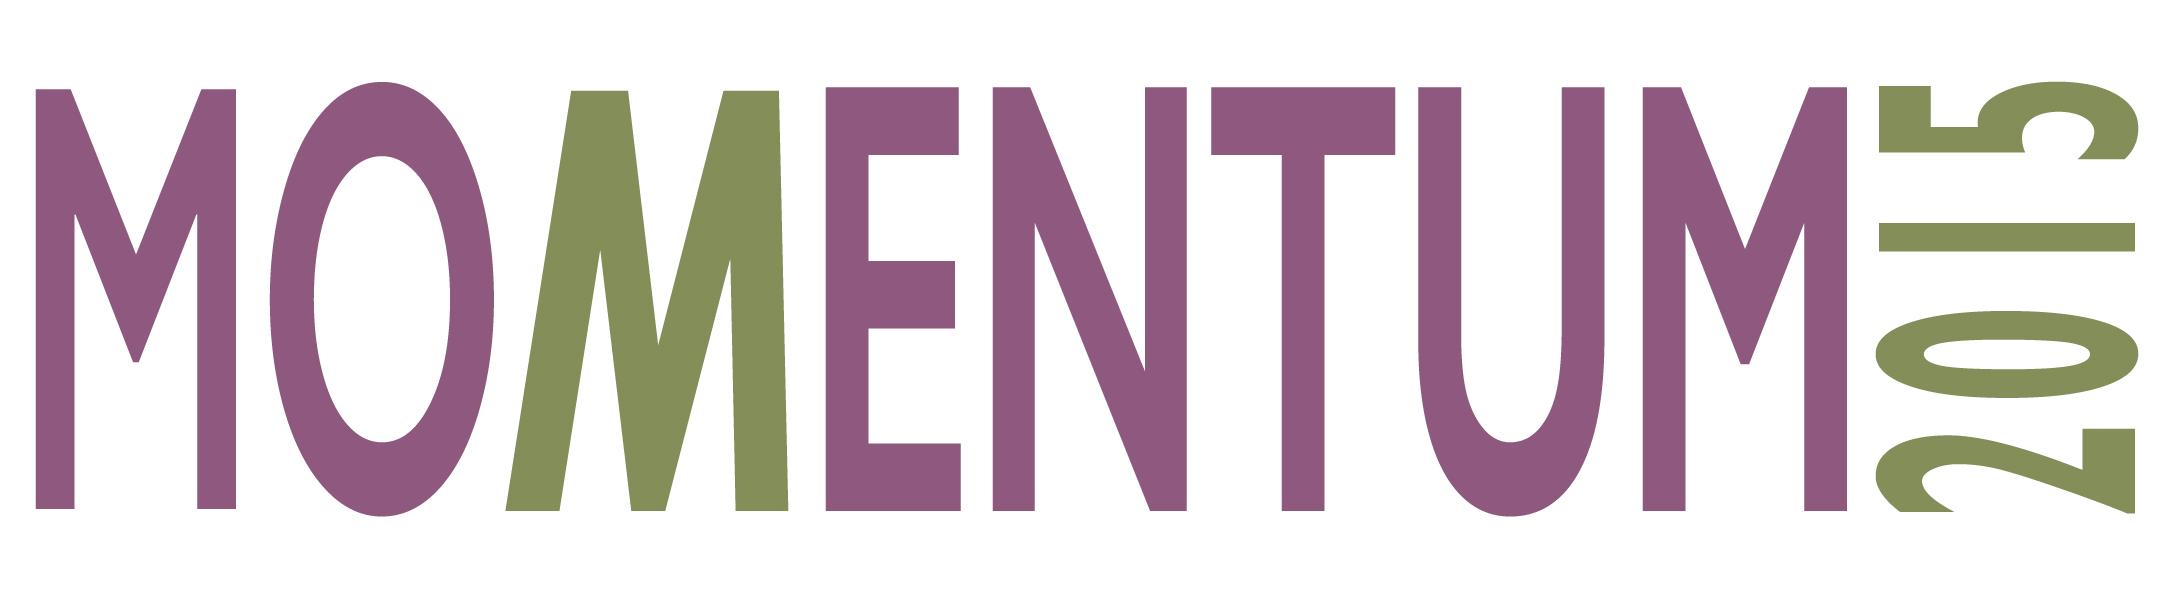 Momentum 2015 logo